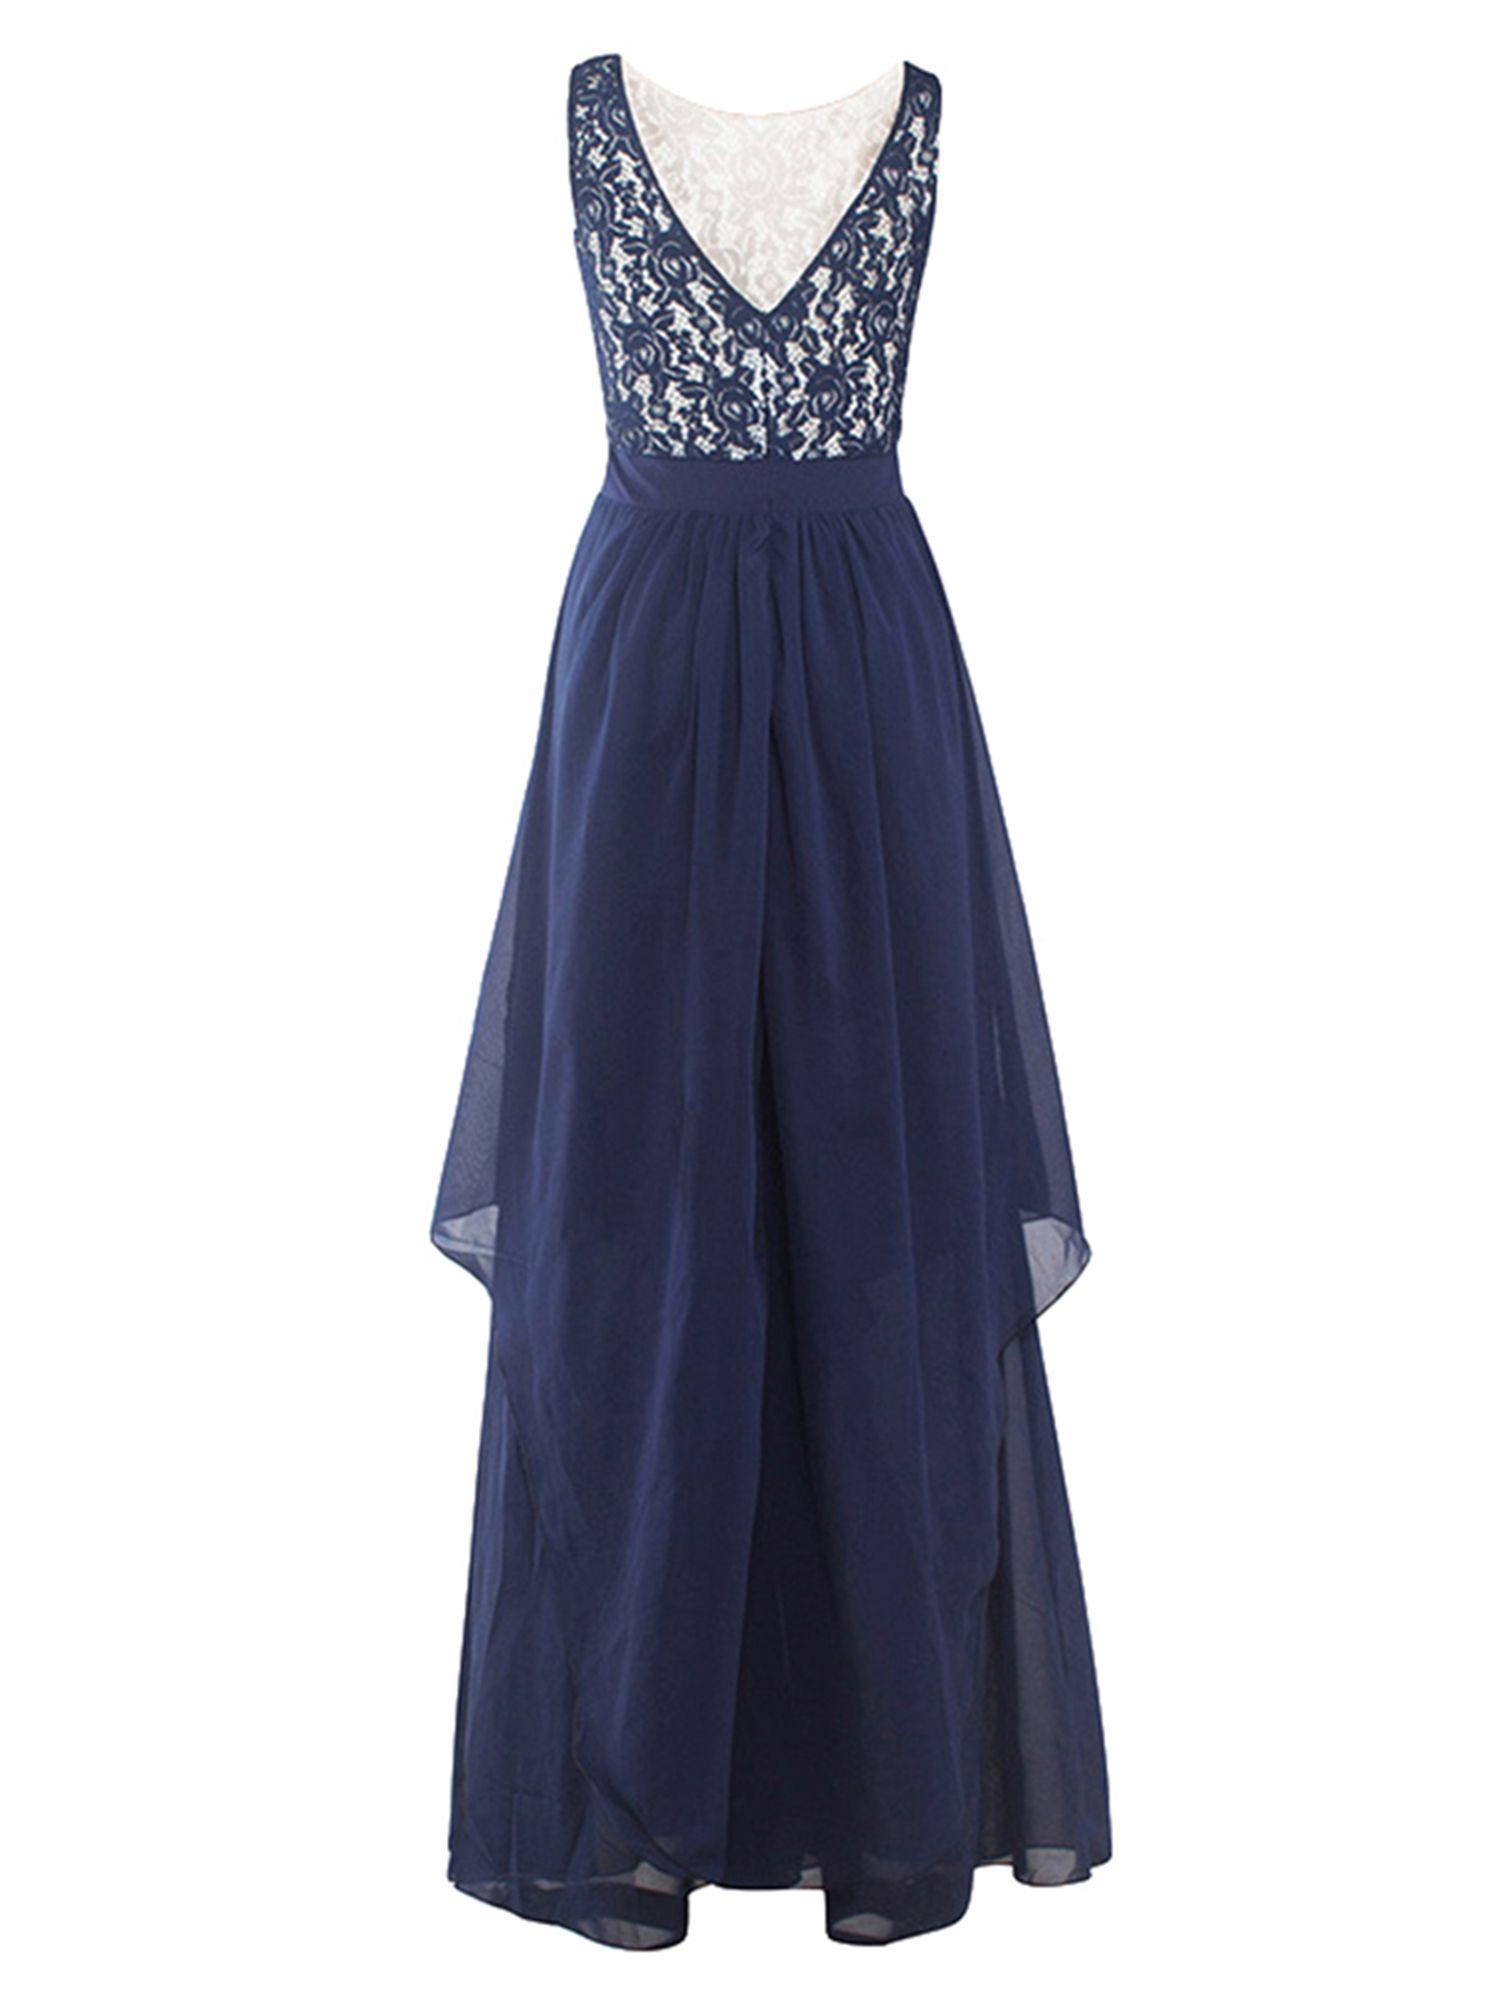 53b349a497c4 Women Party Ball Gowns Long Maxi Dress Lace Chiffon Wedding Bridesmaid  Floor-Length Sleeveless Evening Cocktail Prom Dresses  Ad  Dress